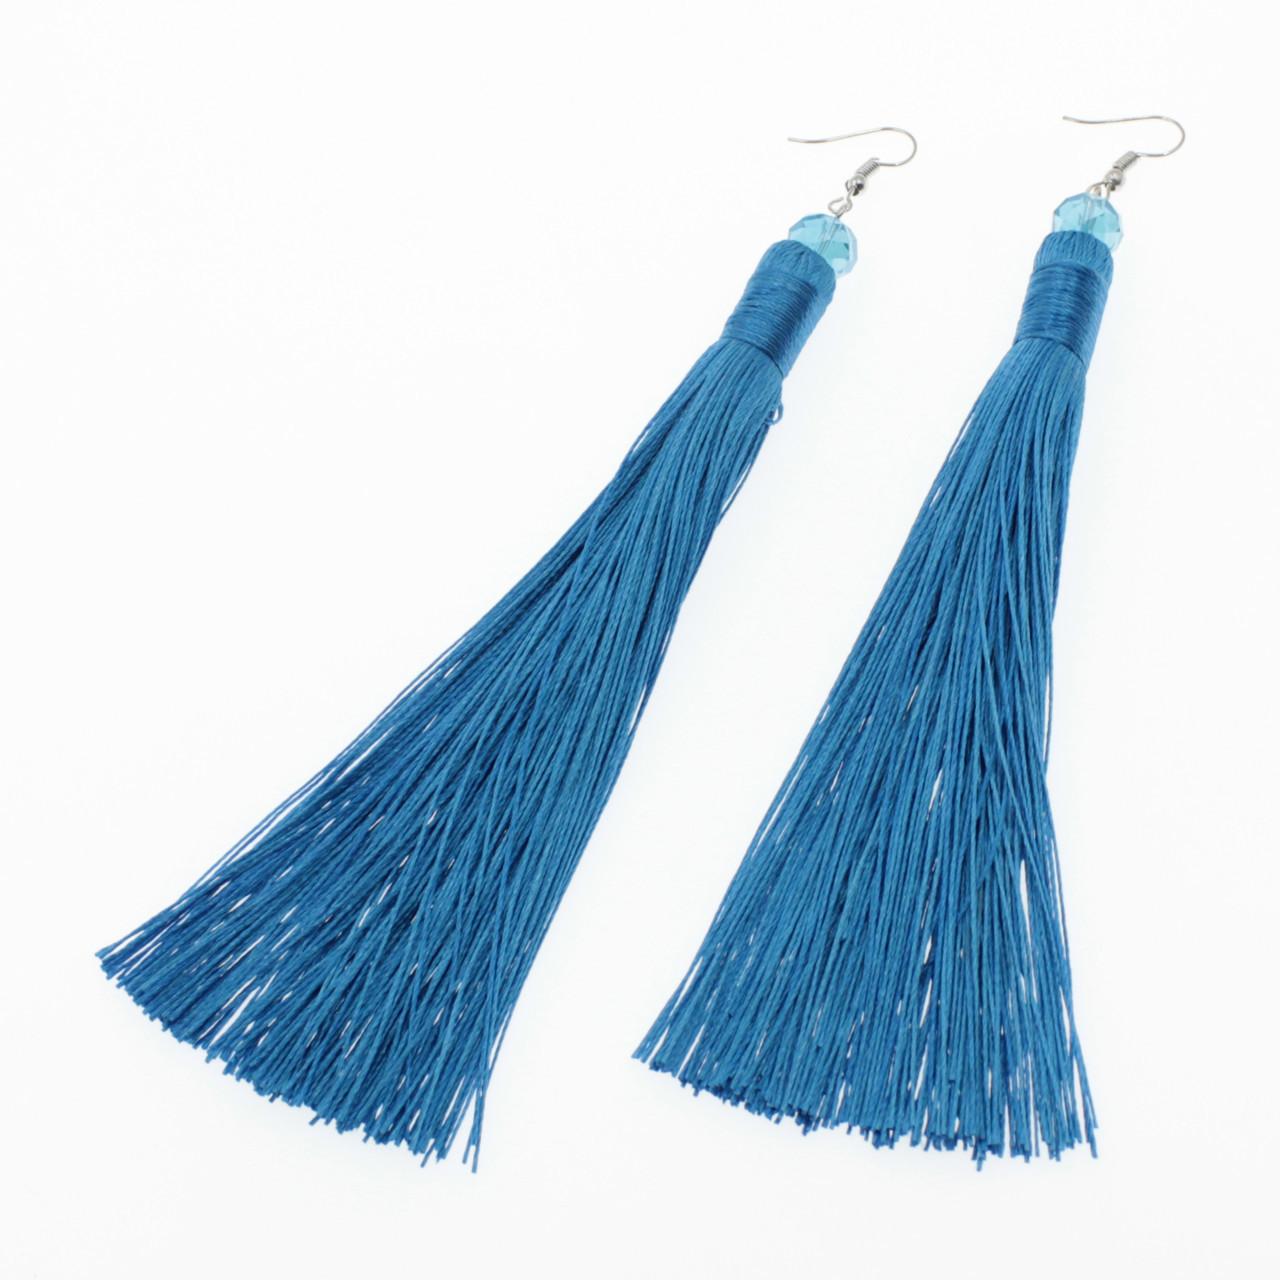 "Серьги-кисти (кисточки)  ""Arabella Blue lux"" L - 14 см"